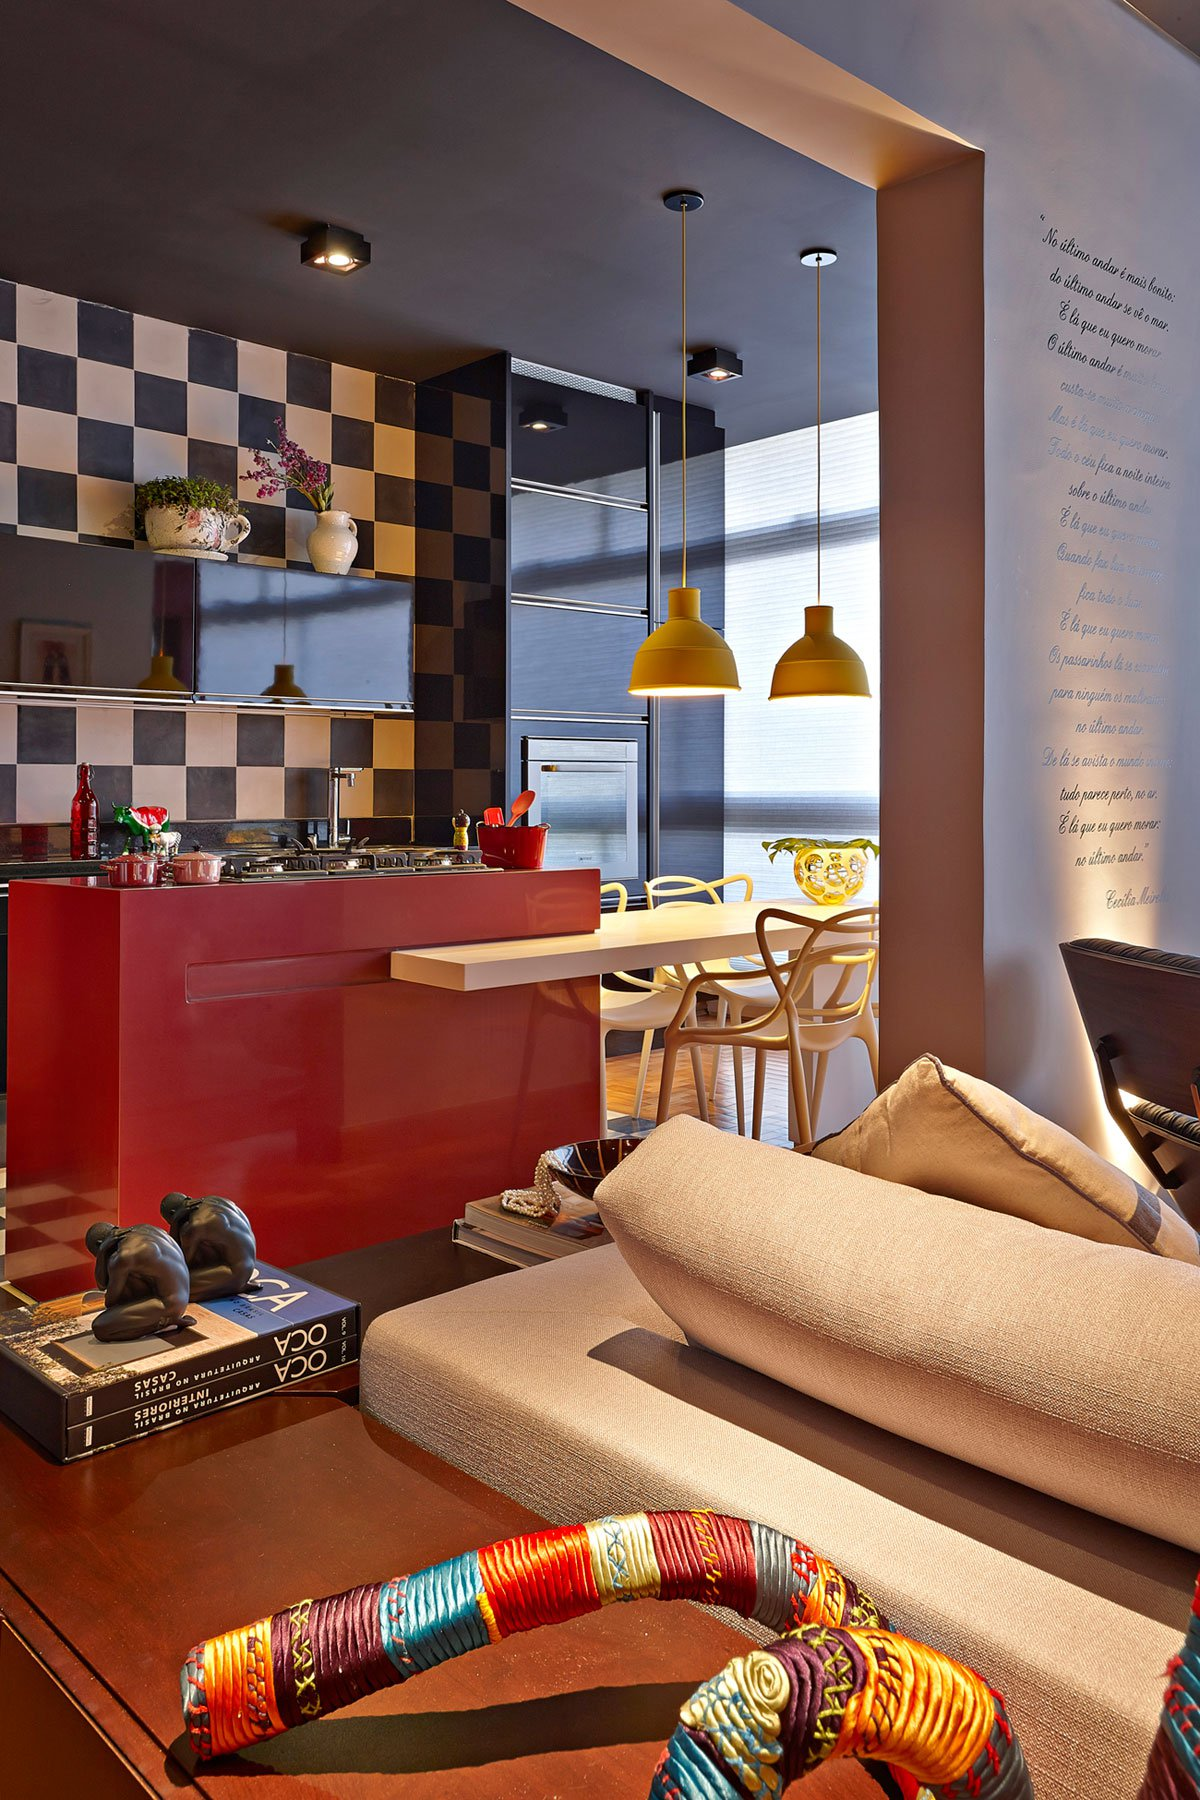 Apartment-in-Belo-Horizonte-02